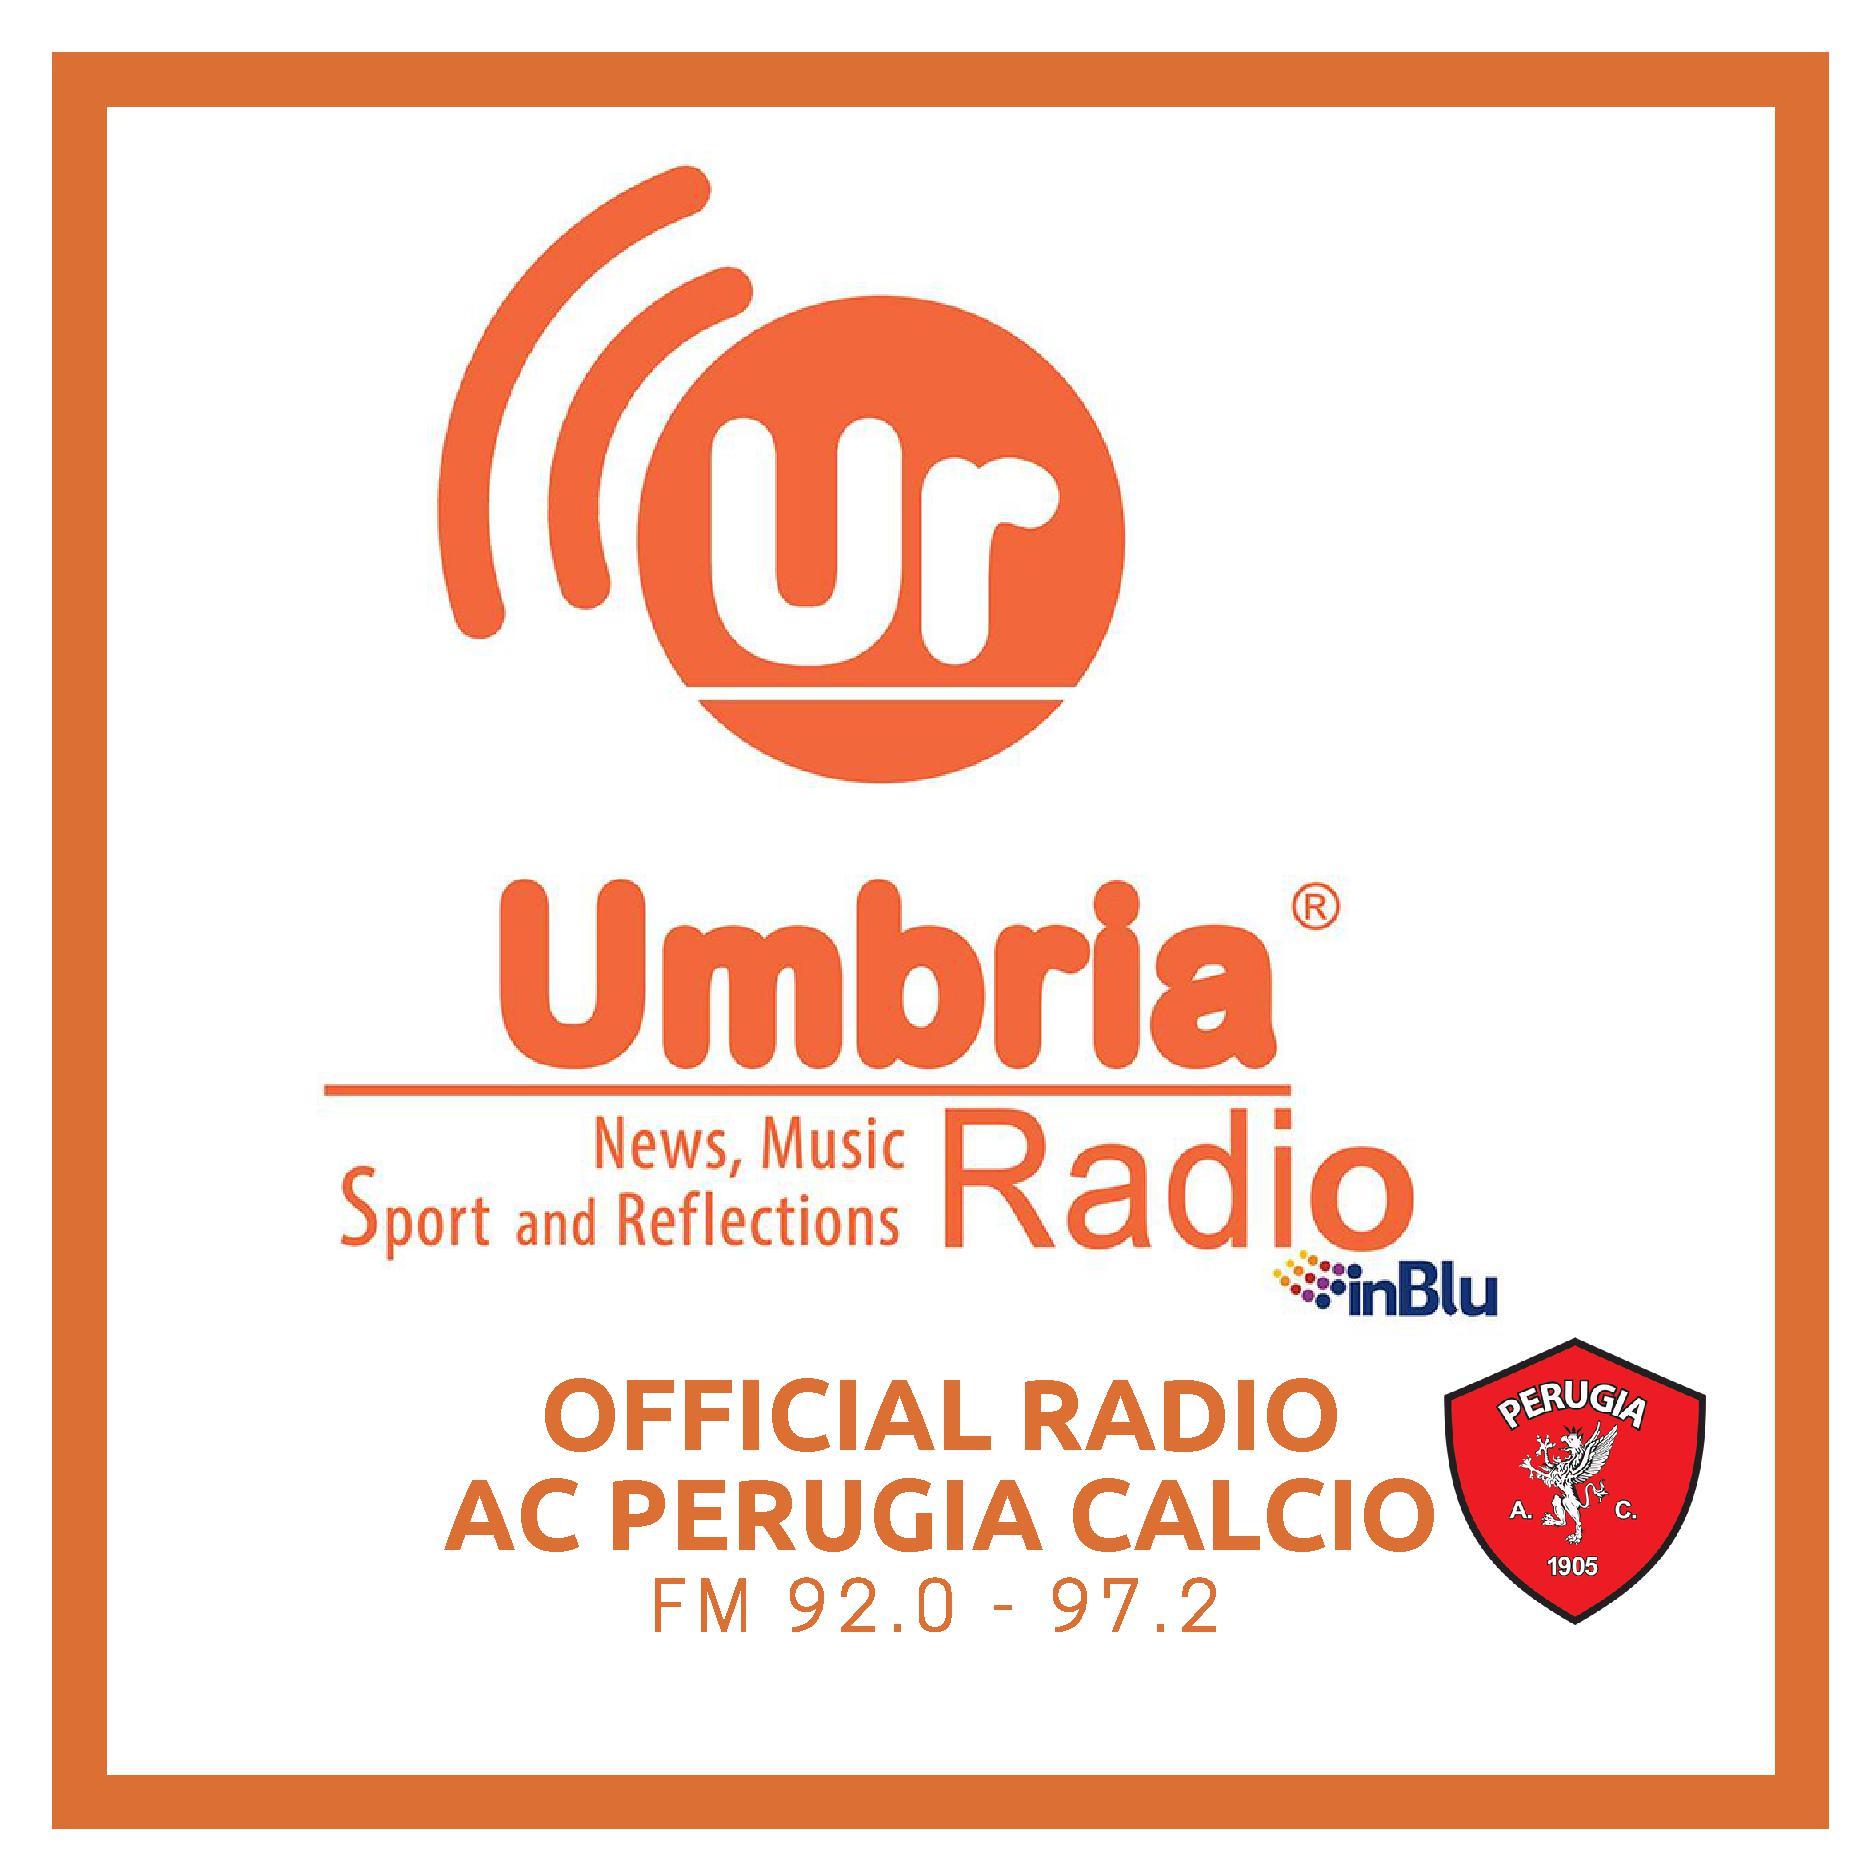 Calendario Ac Perugia.Calendario A C Perugia Calcio Sito Ufficiale